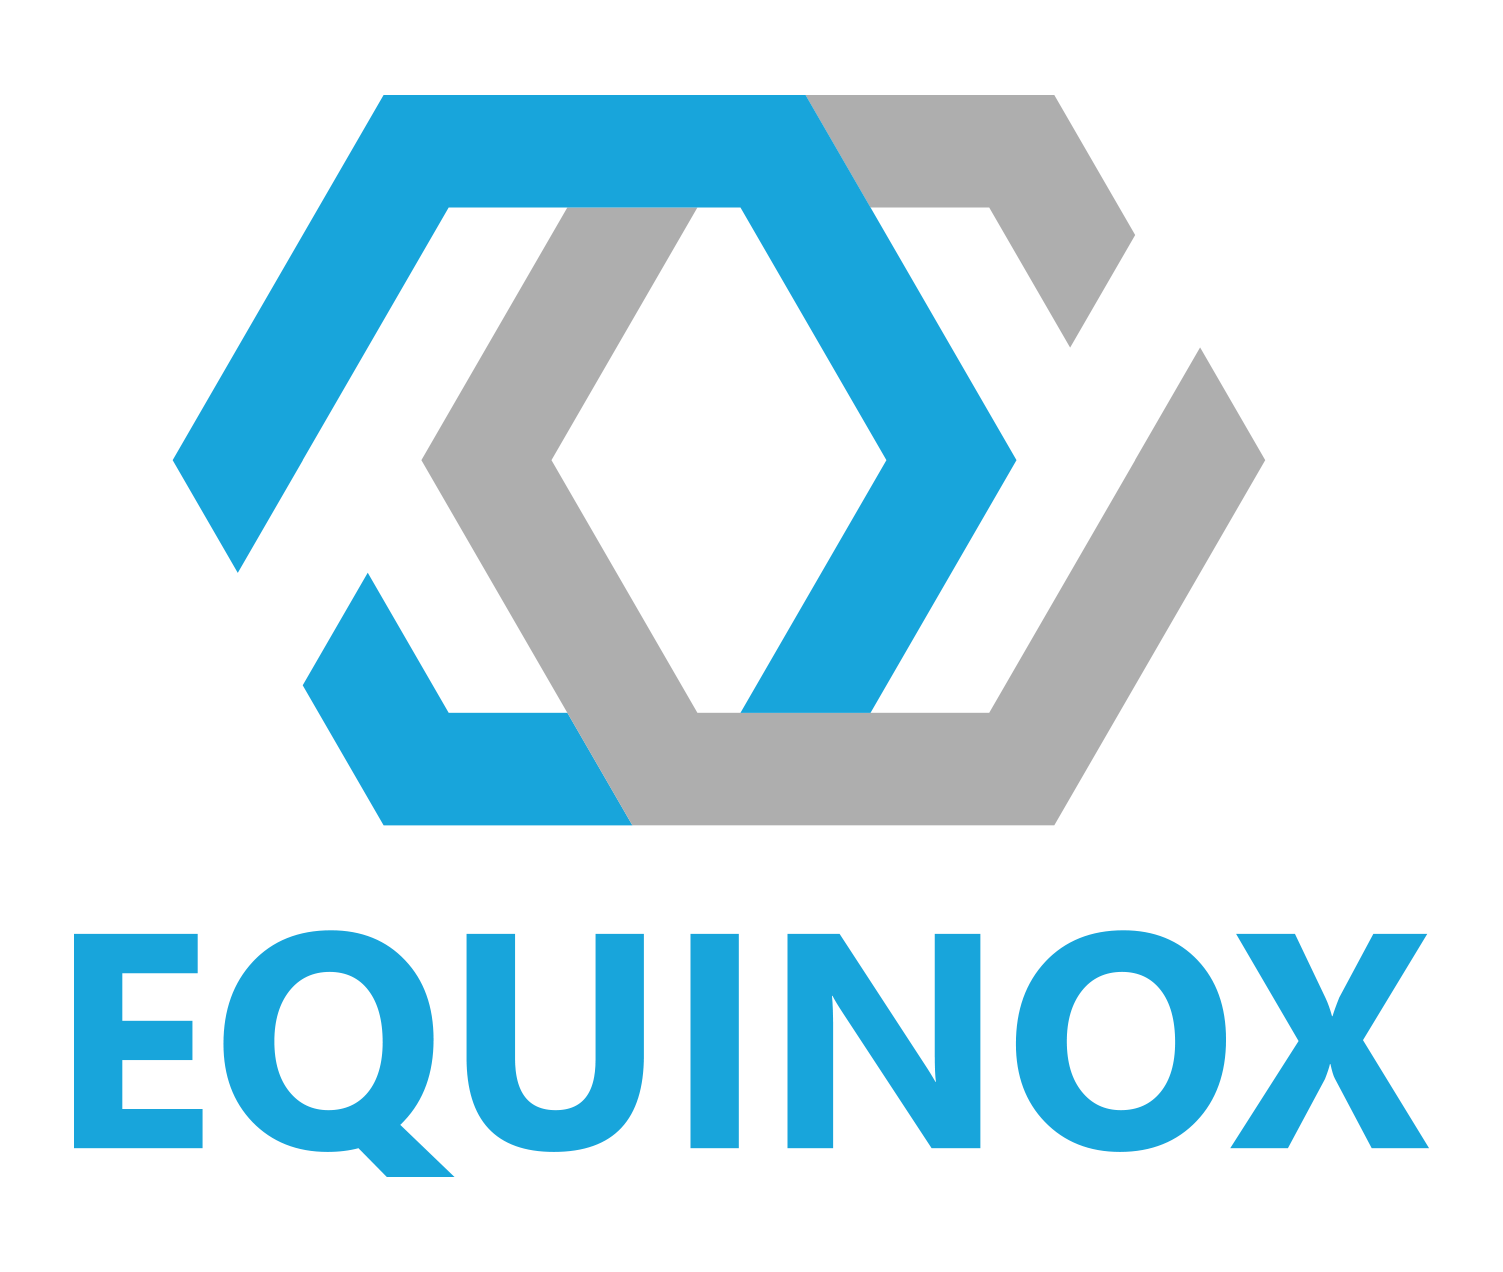 Equinox-1